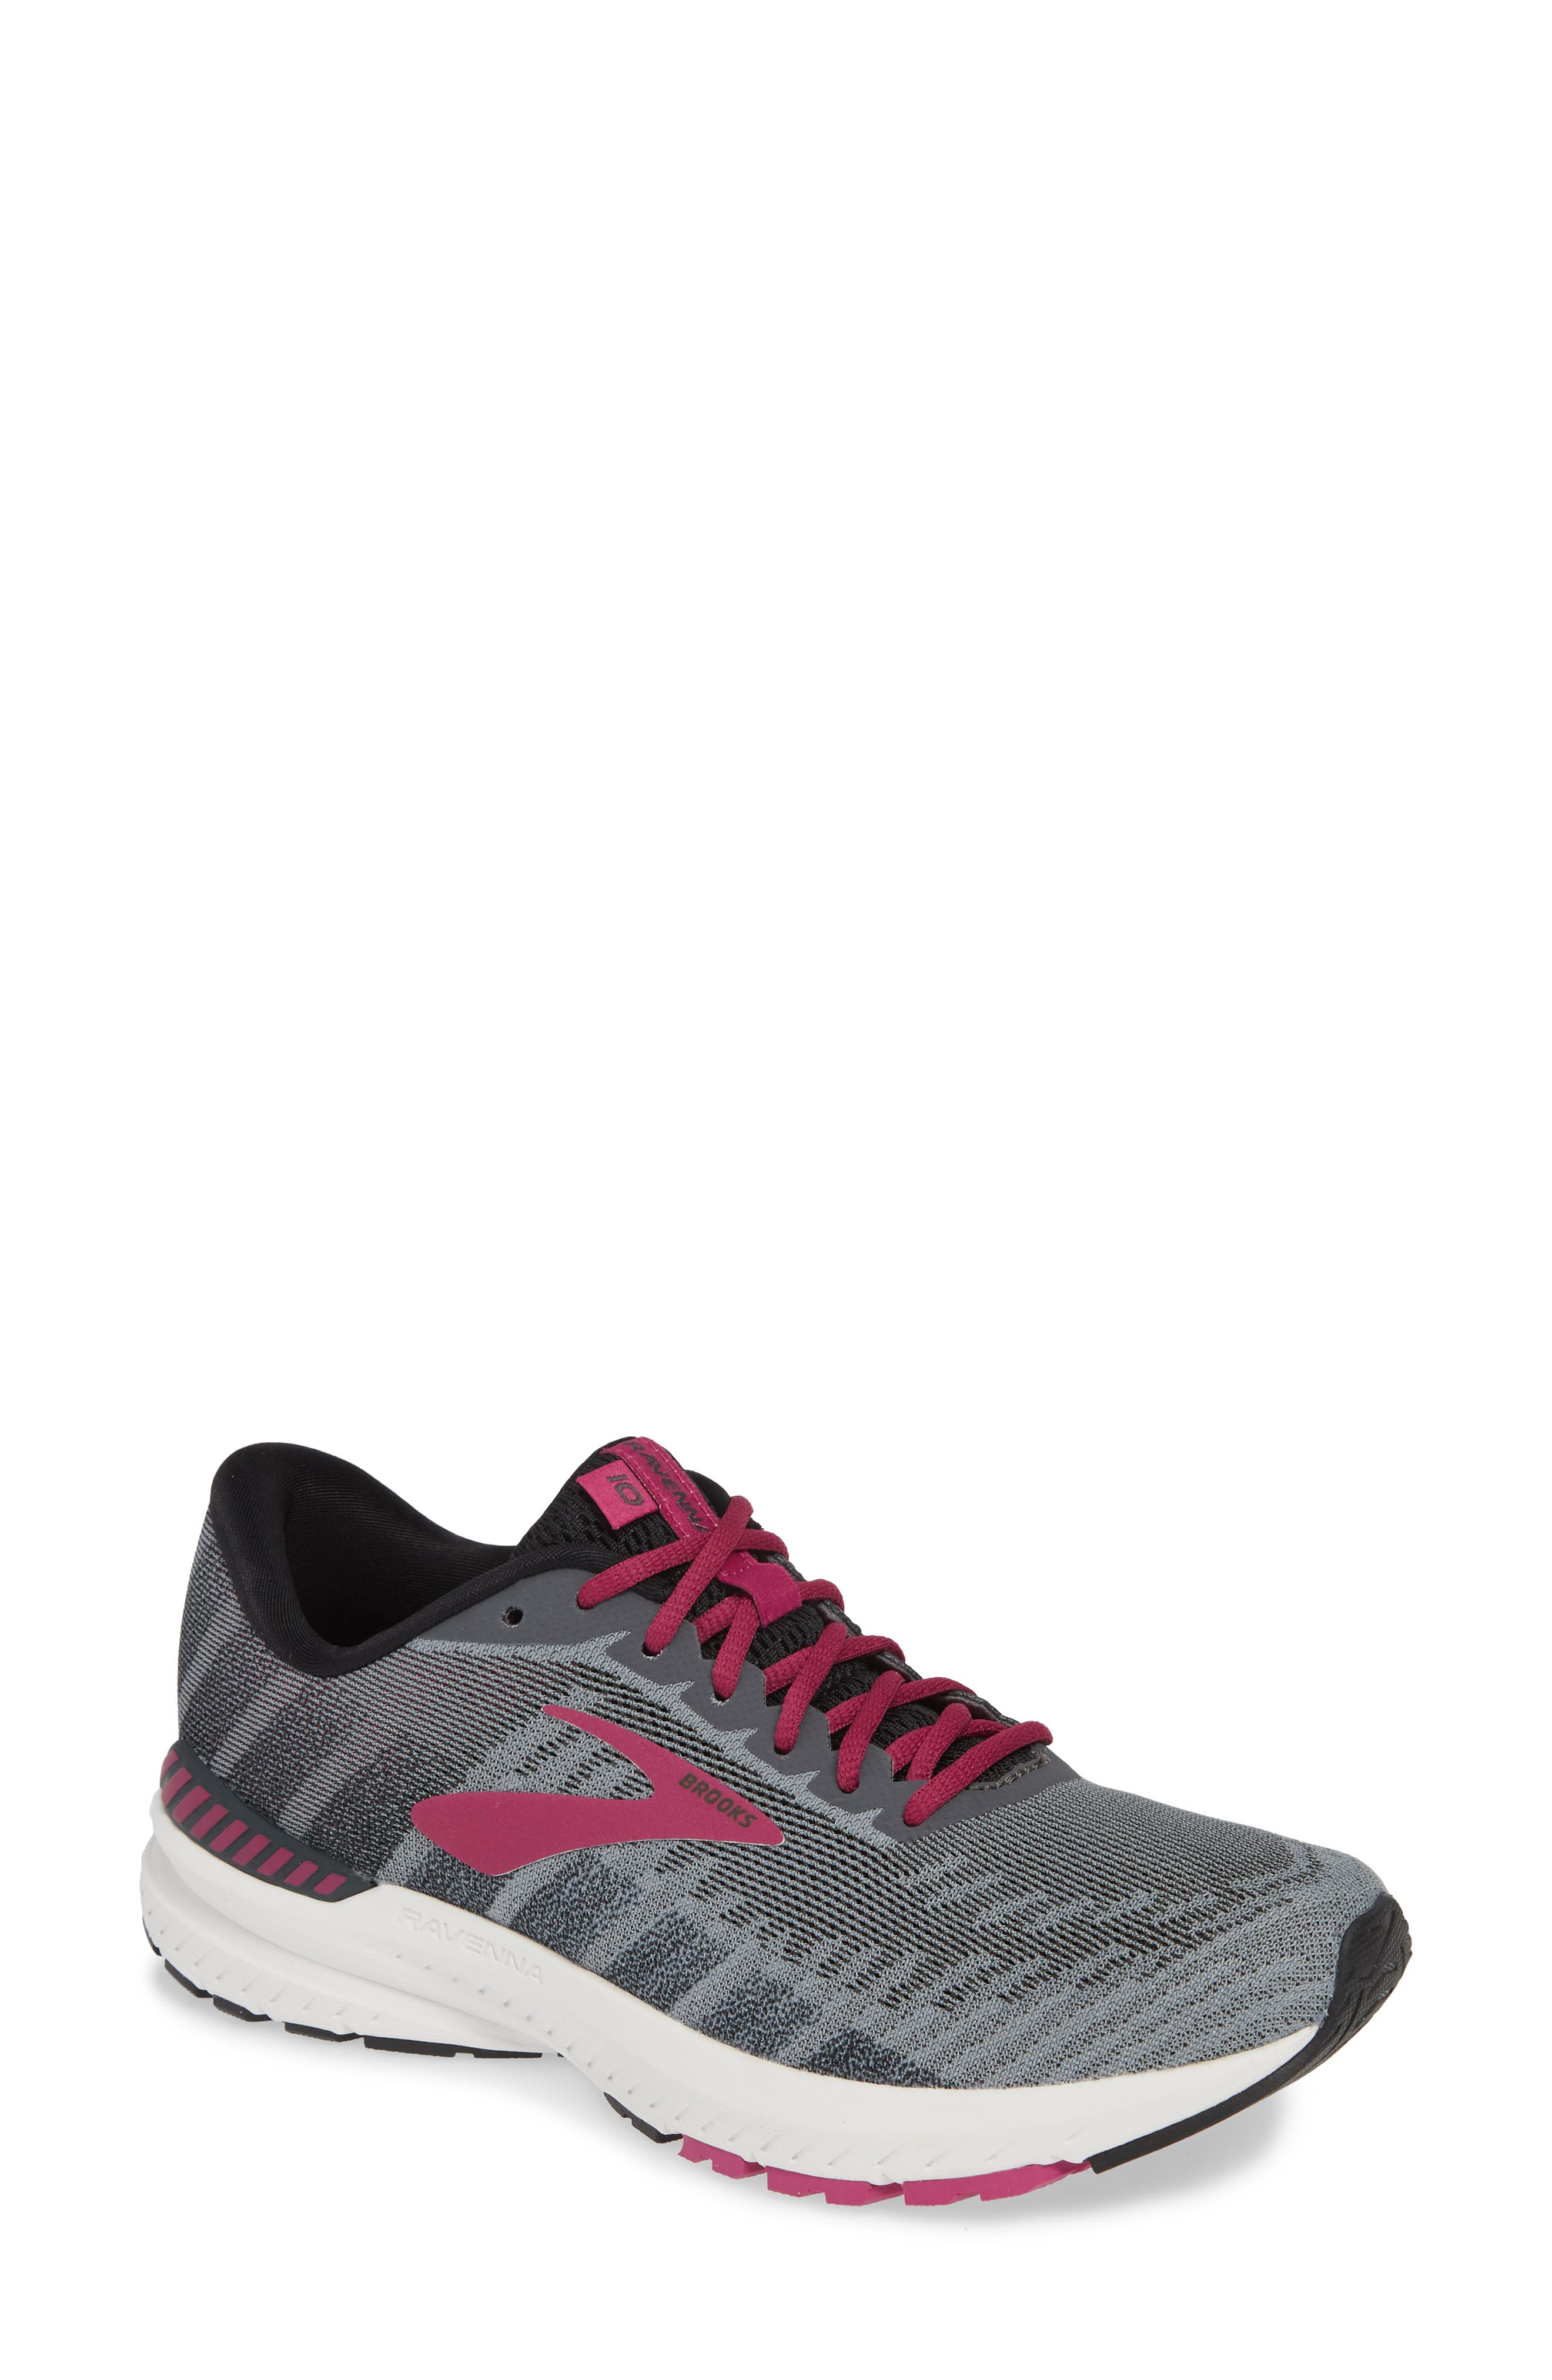 Brooks Ravenna 10 Running Shoe, Grey